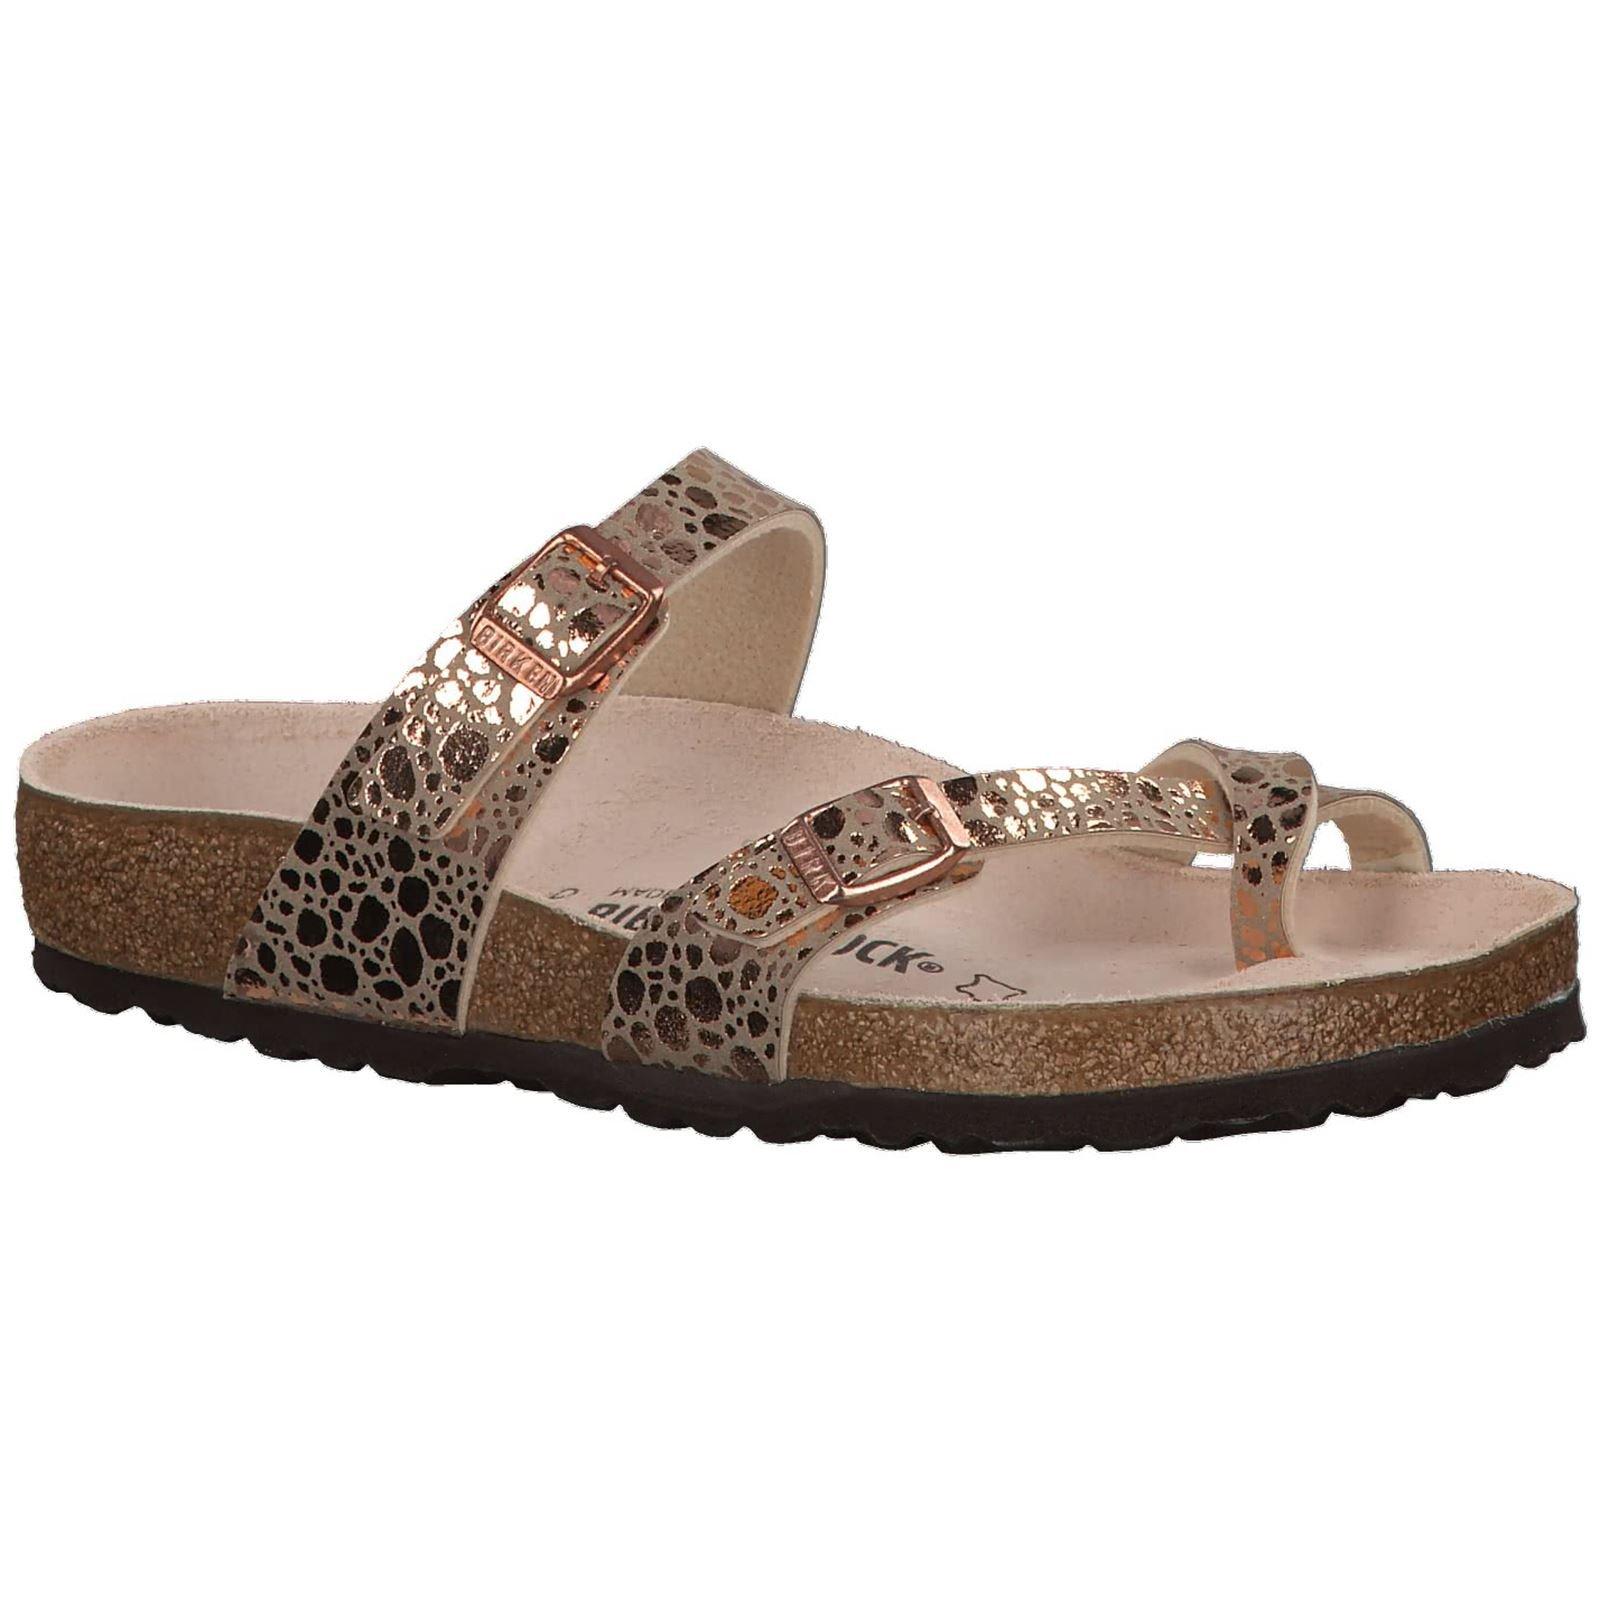 Birkenstock Womens Mayari Metallic Stones Copper Birko-Flor Sandals 38 EU